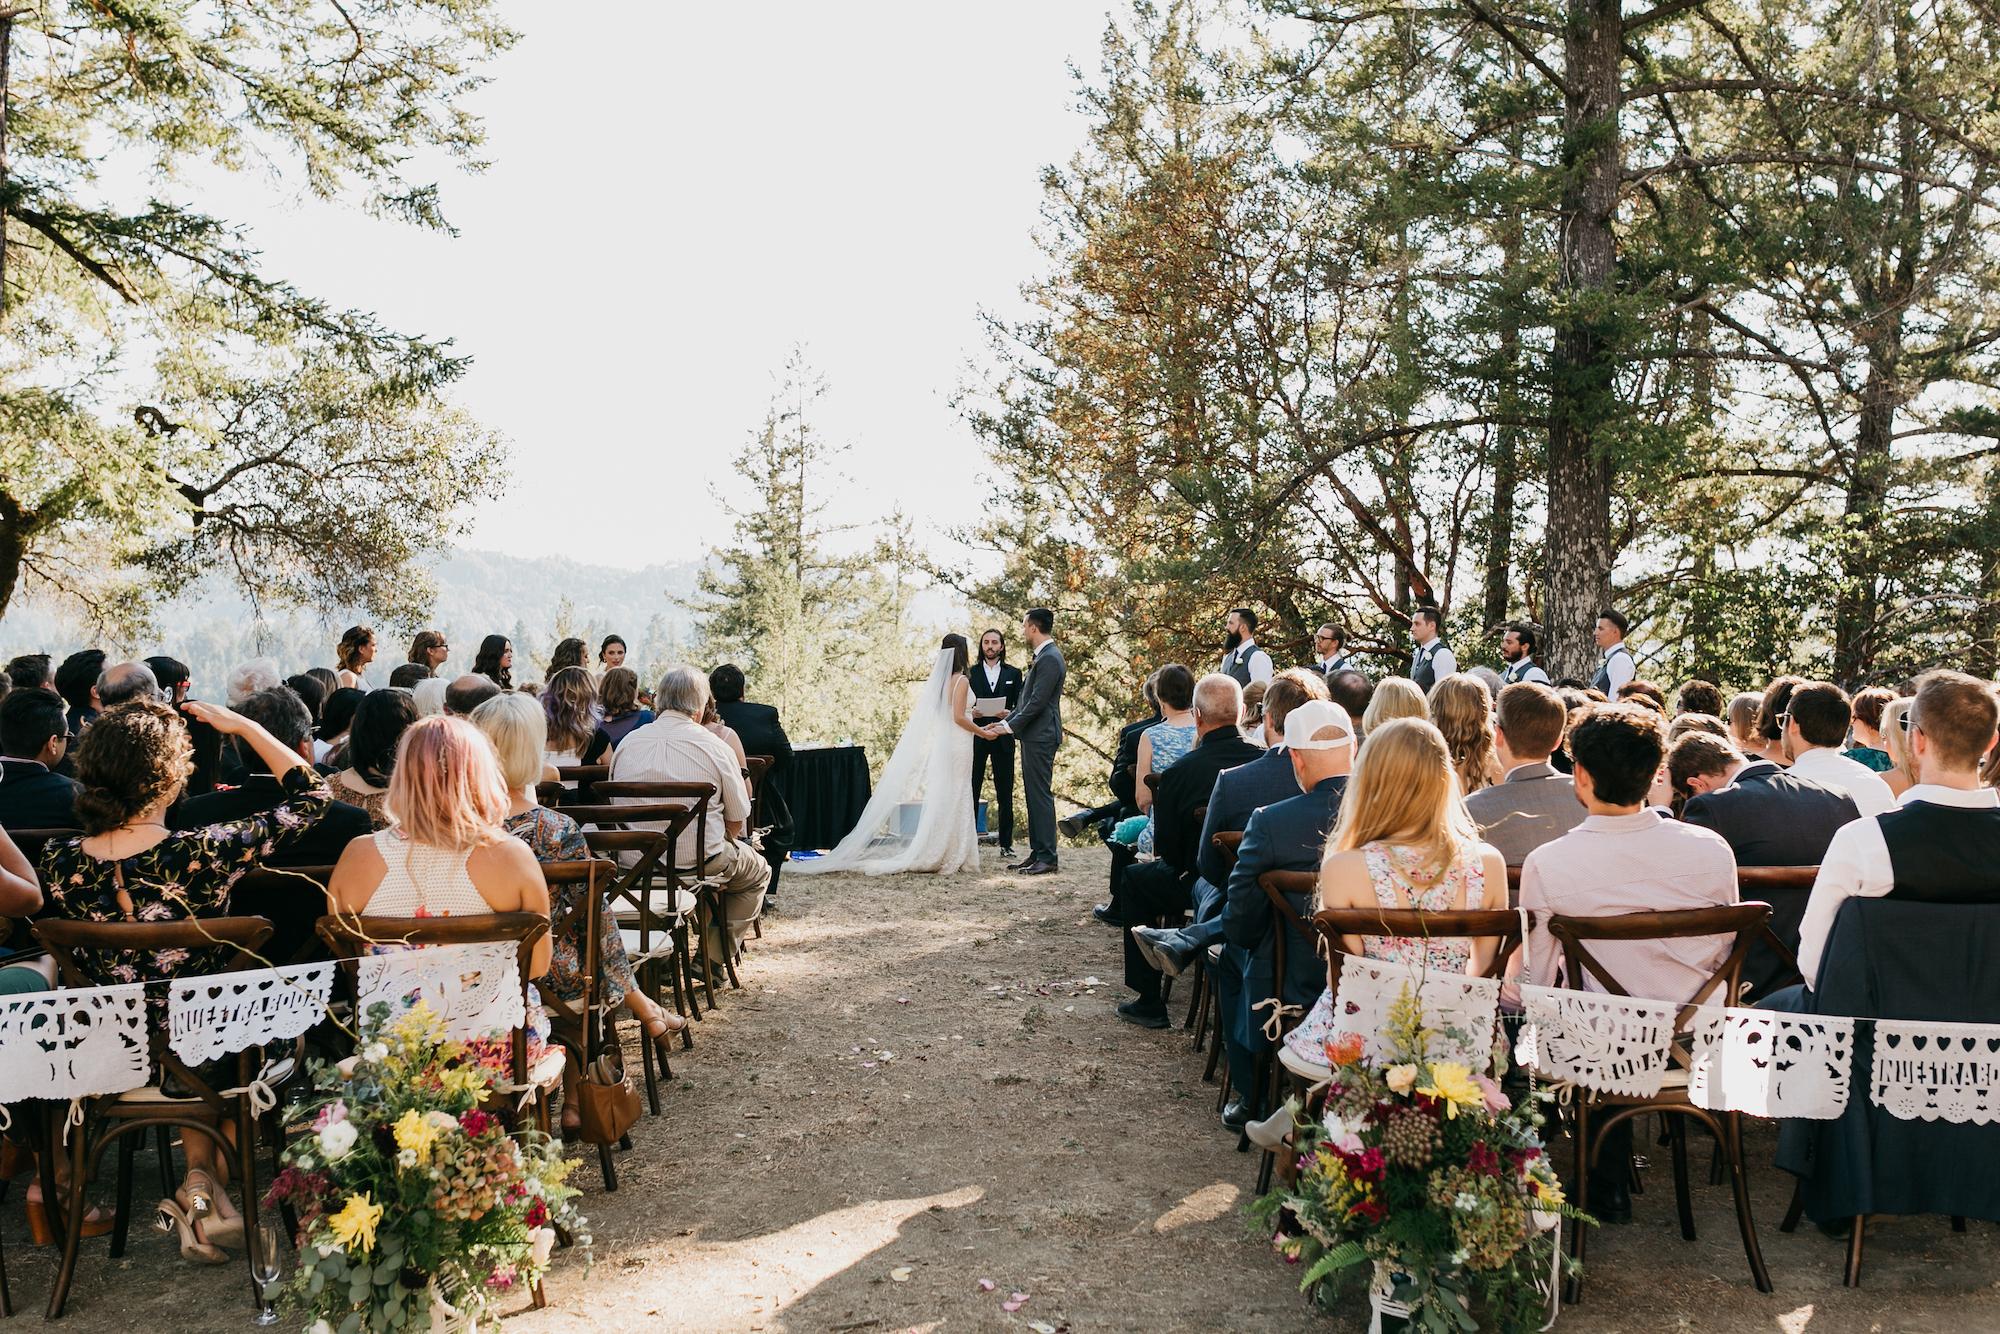 anvil-vineyards-wedding-photographer433.jpg